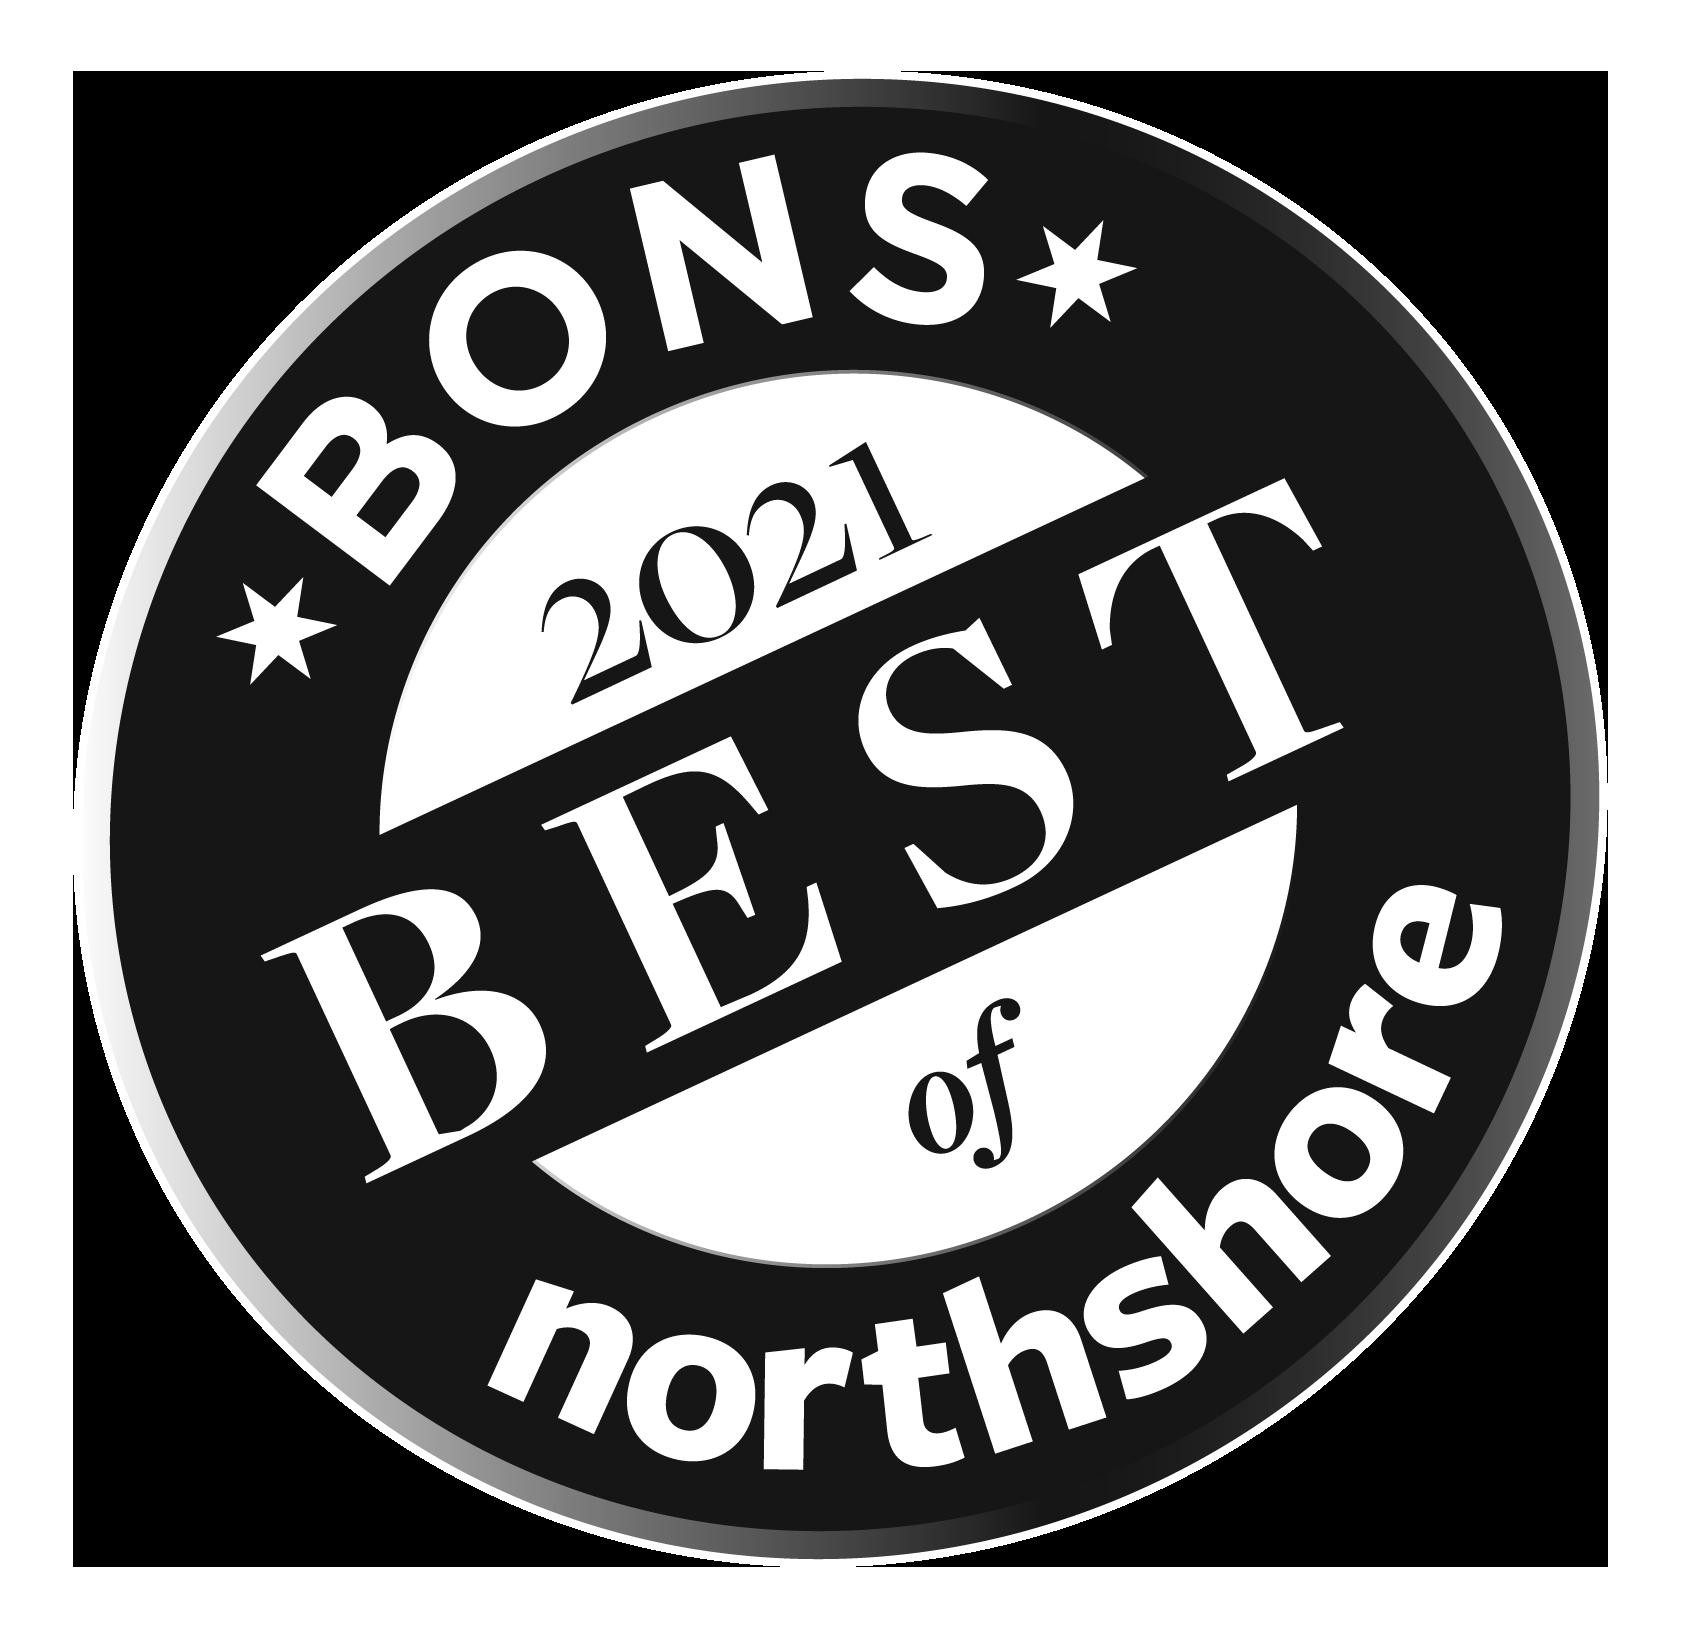 BONS 2021